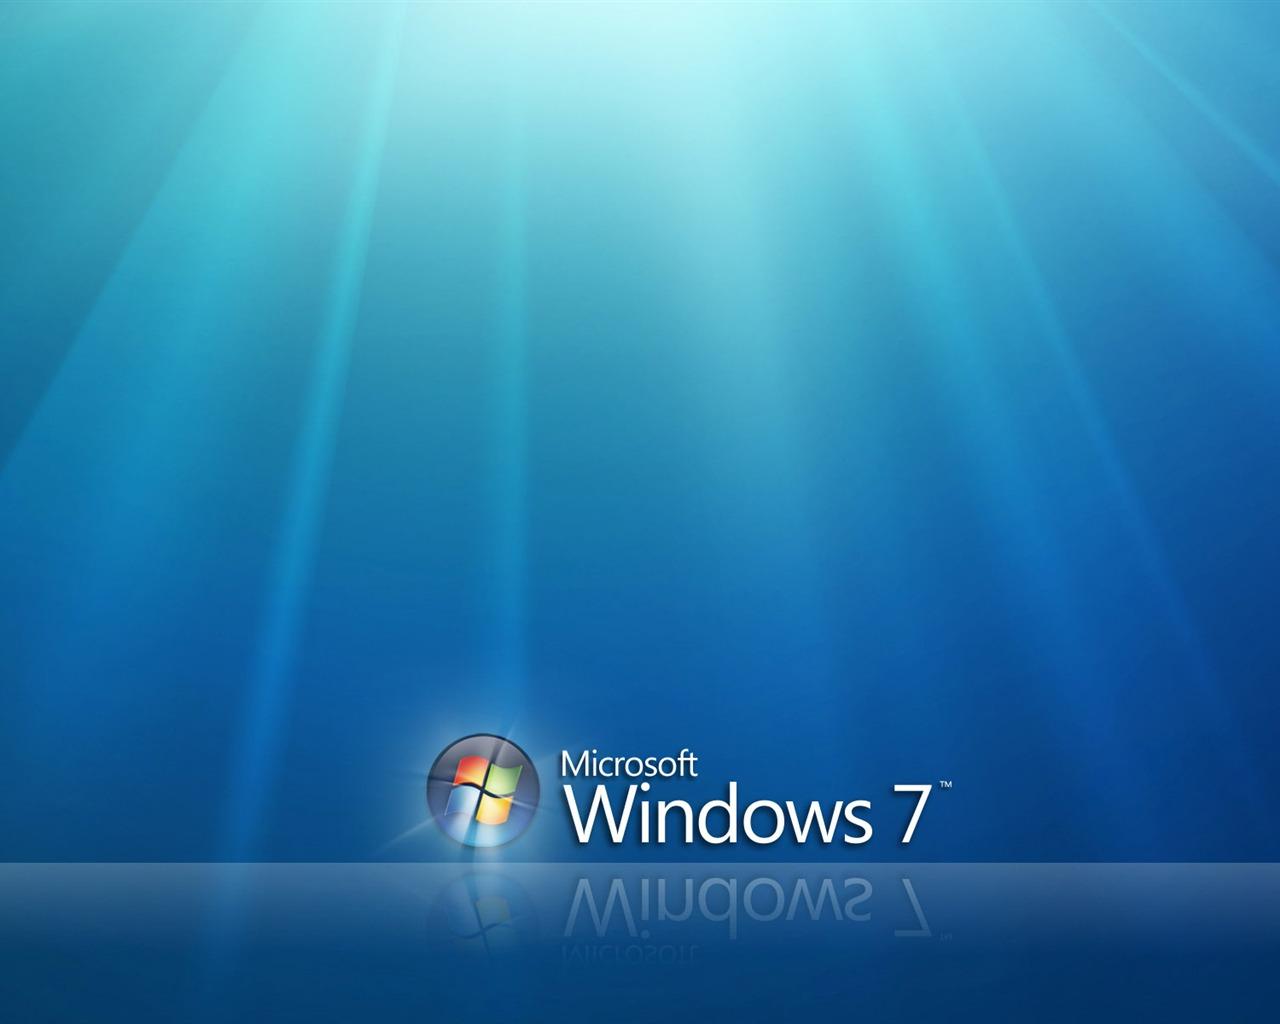 Windows7 Wallpaper 27 1280x1024 Wallpaper Download Windows7